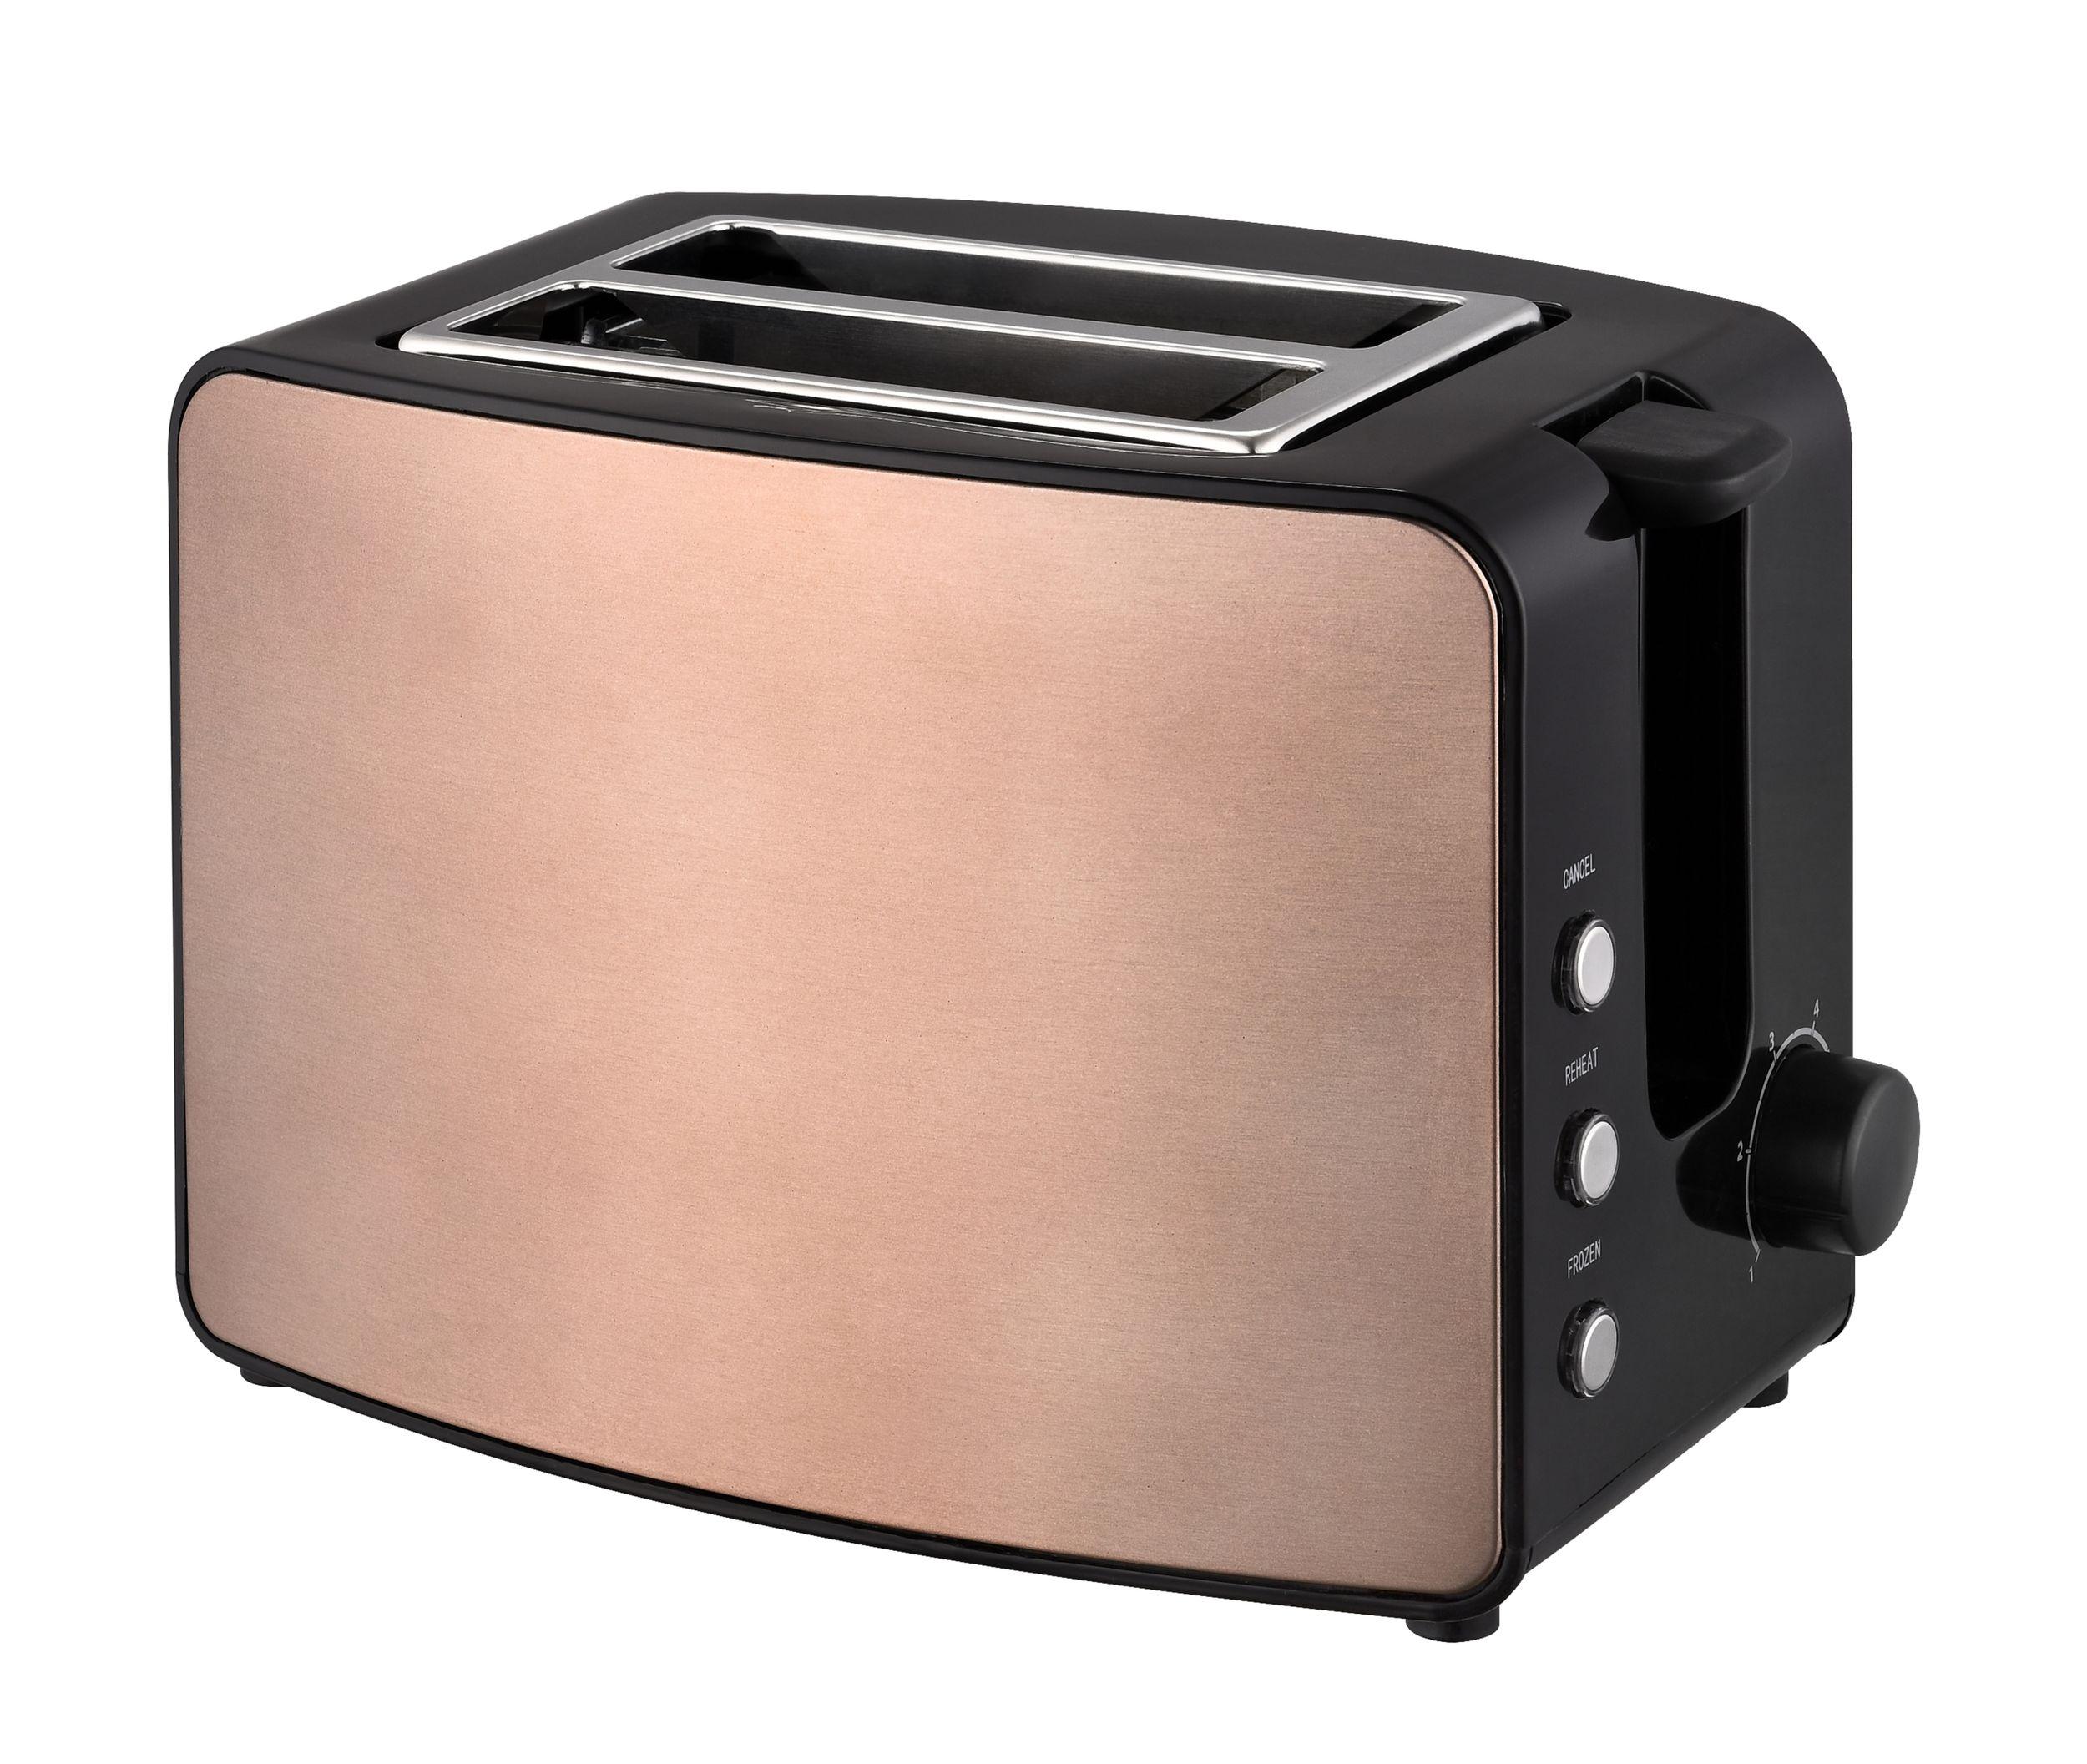 Frühstücksset 3-teilig Toaster 1,7L Wasserkocher Kaffeemaschine 1,9L Havanna Kupfer Braun Bild 8